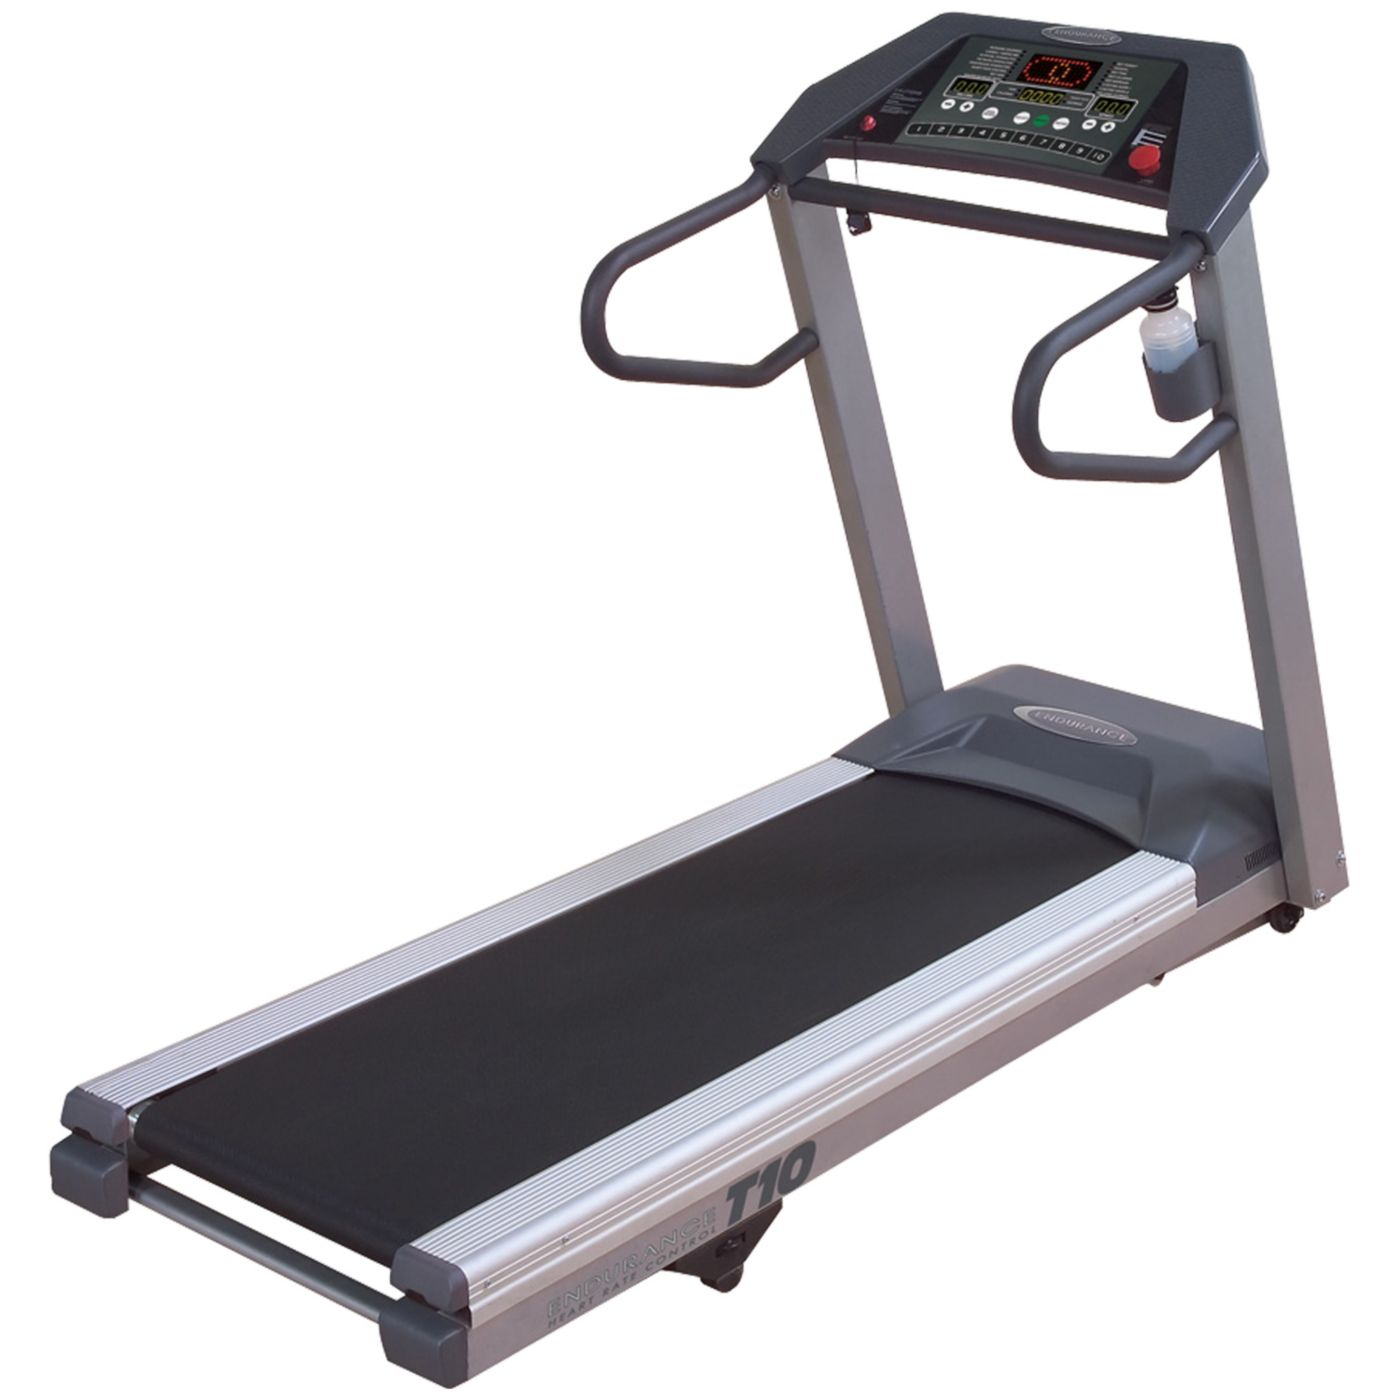 Endurance T10 Commercial Treadmill